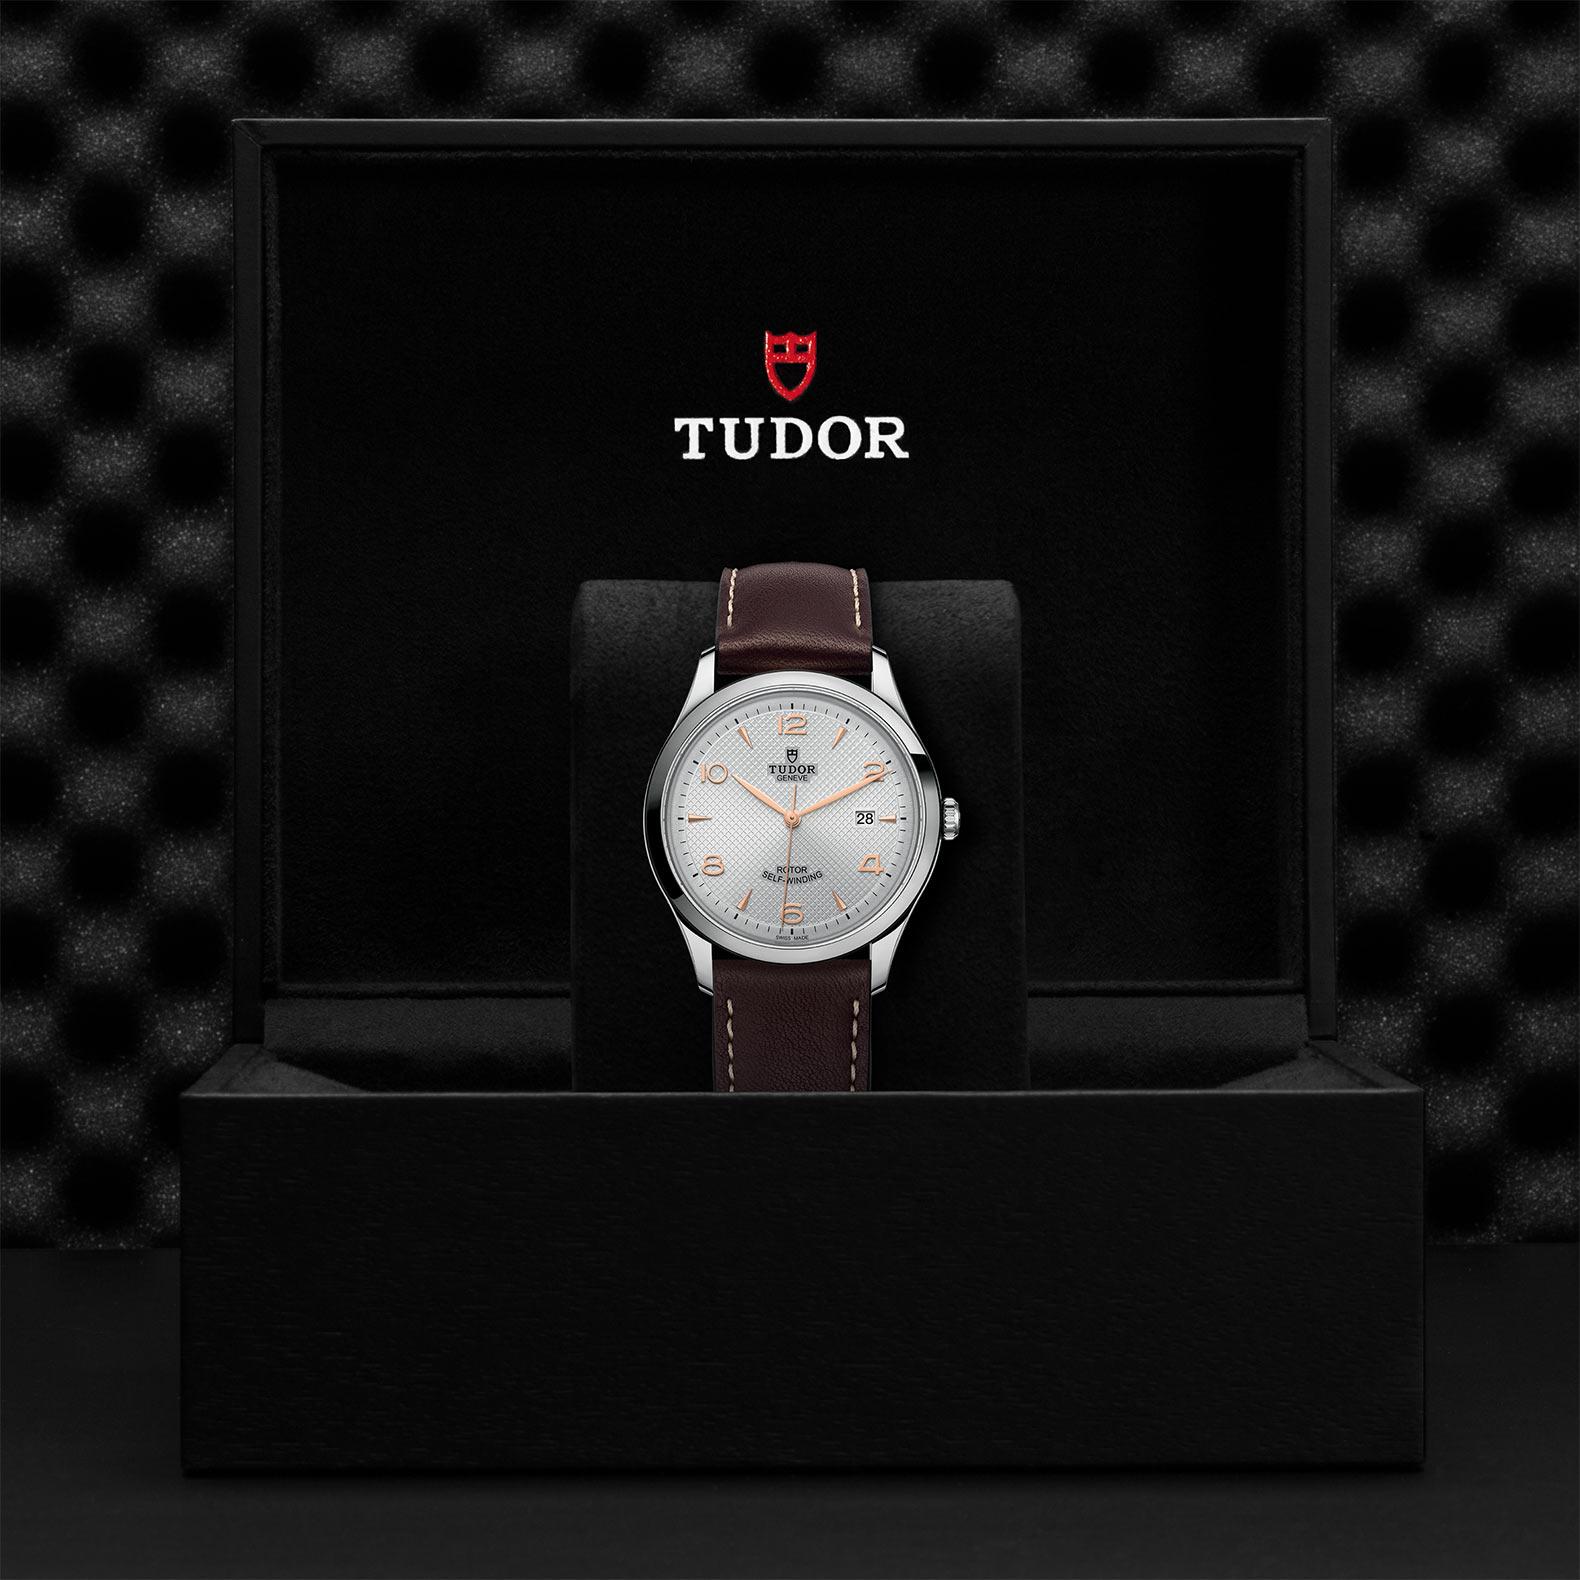 TUDOR 1926 - M91650-0006